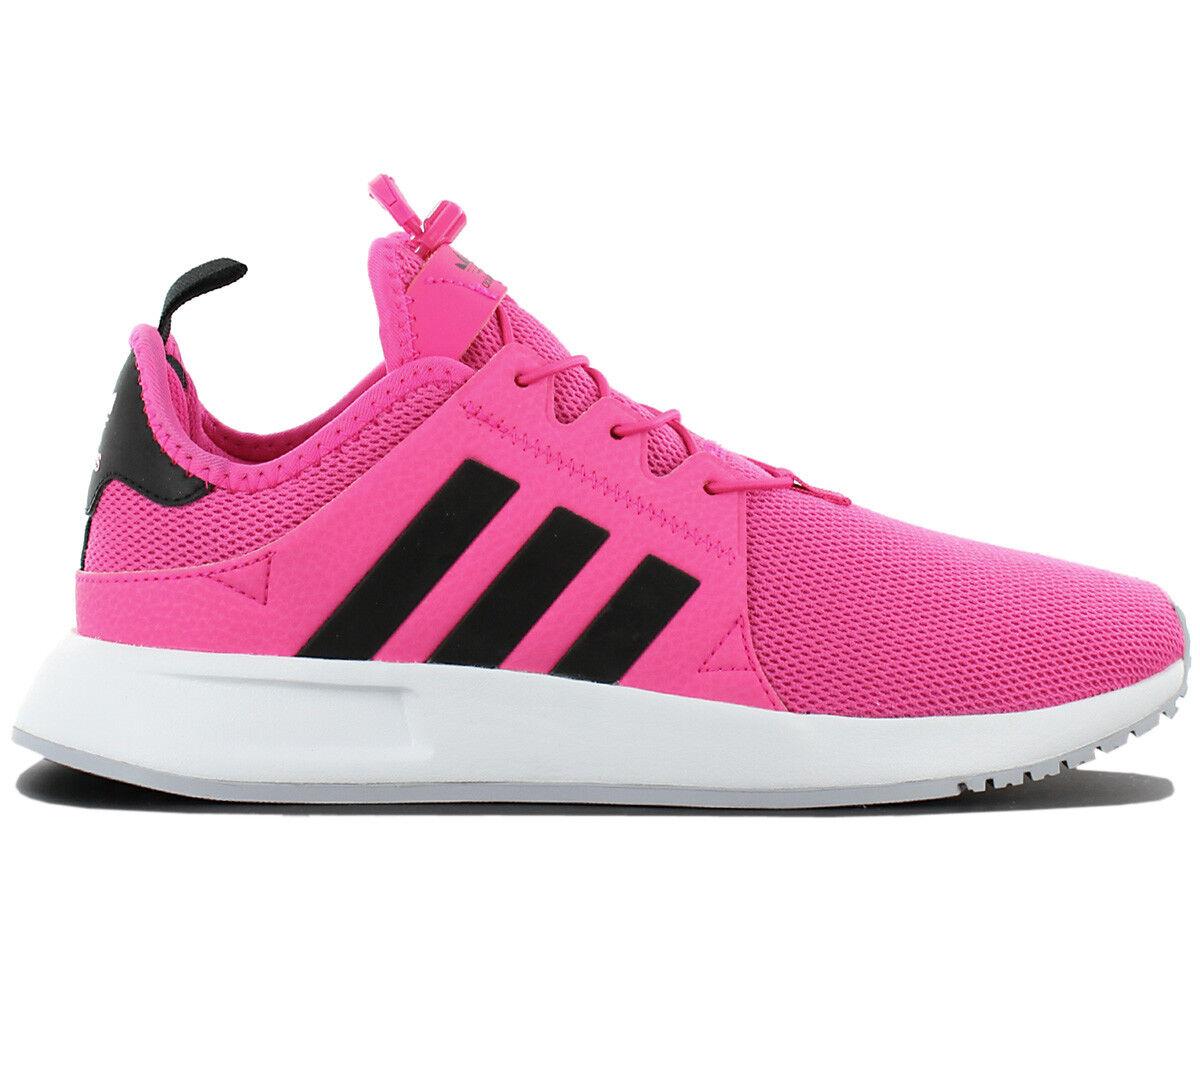 Adidas Originals X PLR Damen Damen Damen Sneaker Schuhe Rosa Freizeit Turnschuhe BB1108 NEU 98fd8c